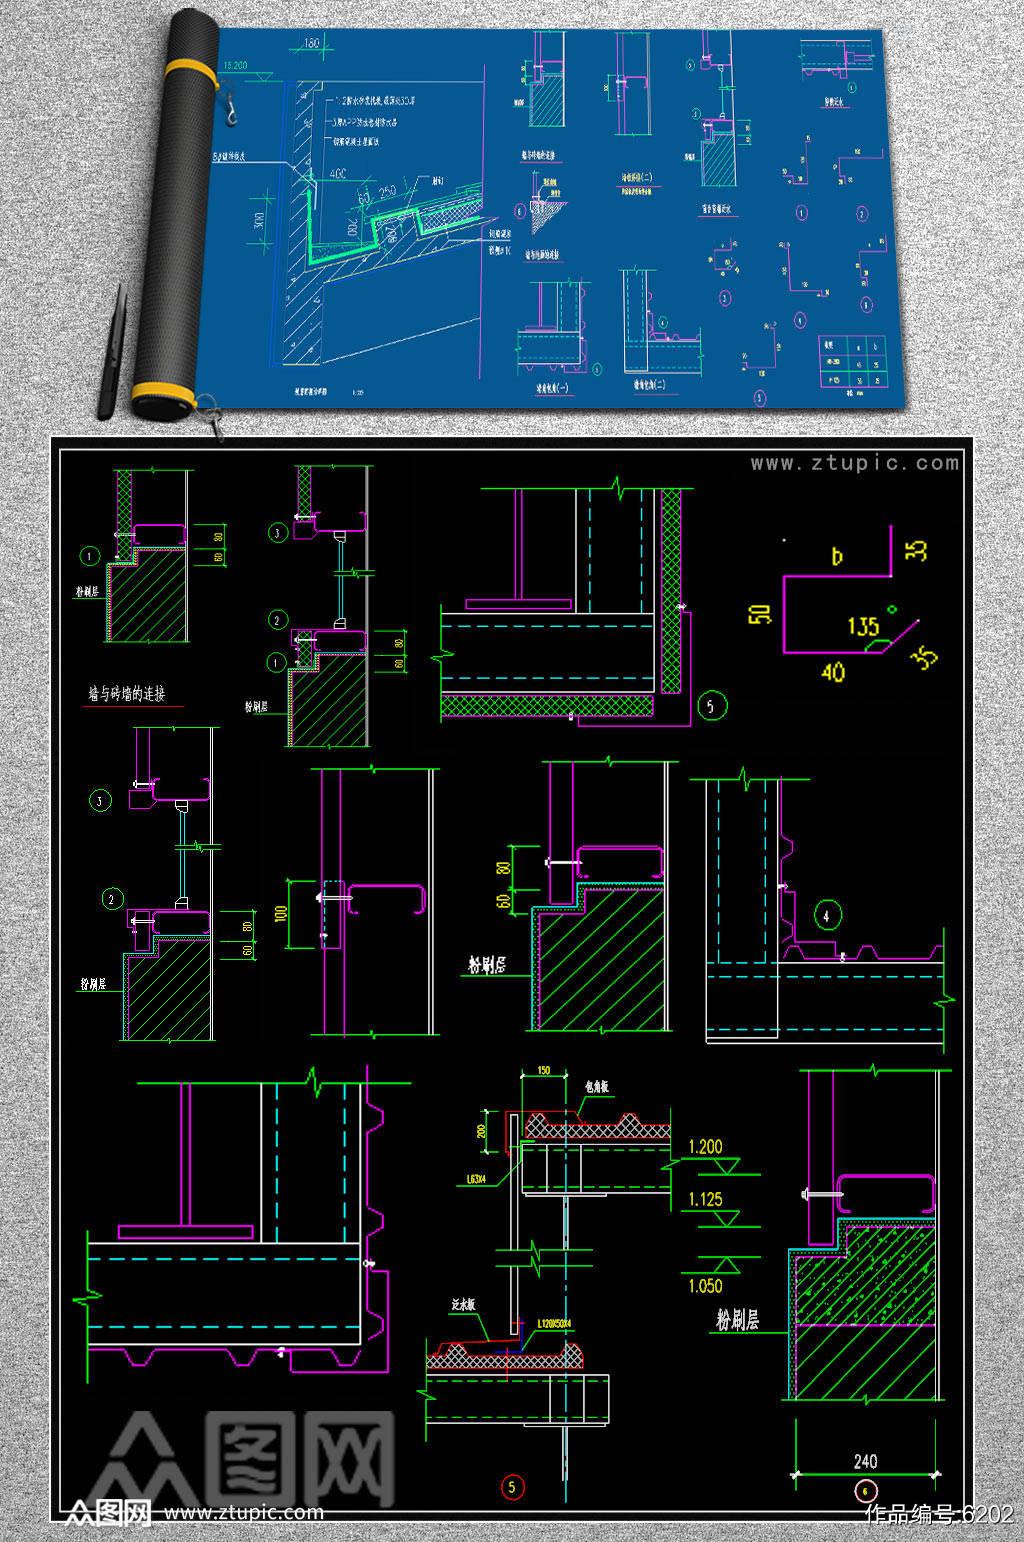 2019墙面节点CAD图块素材